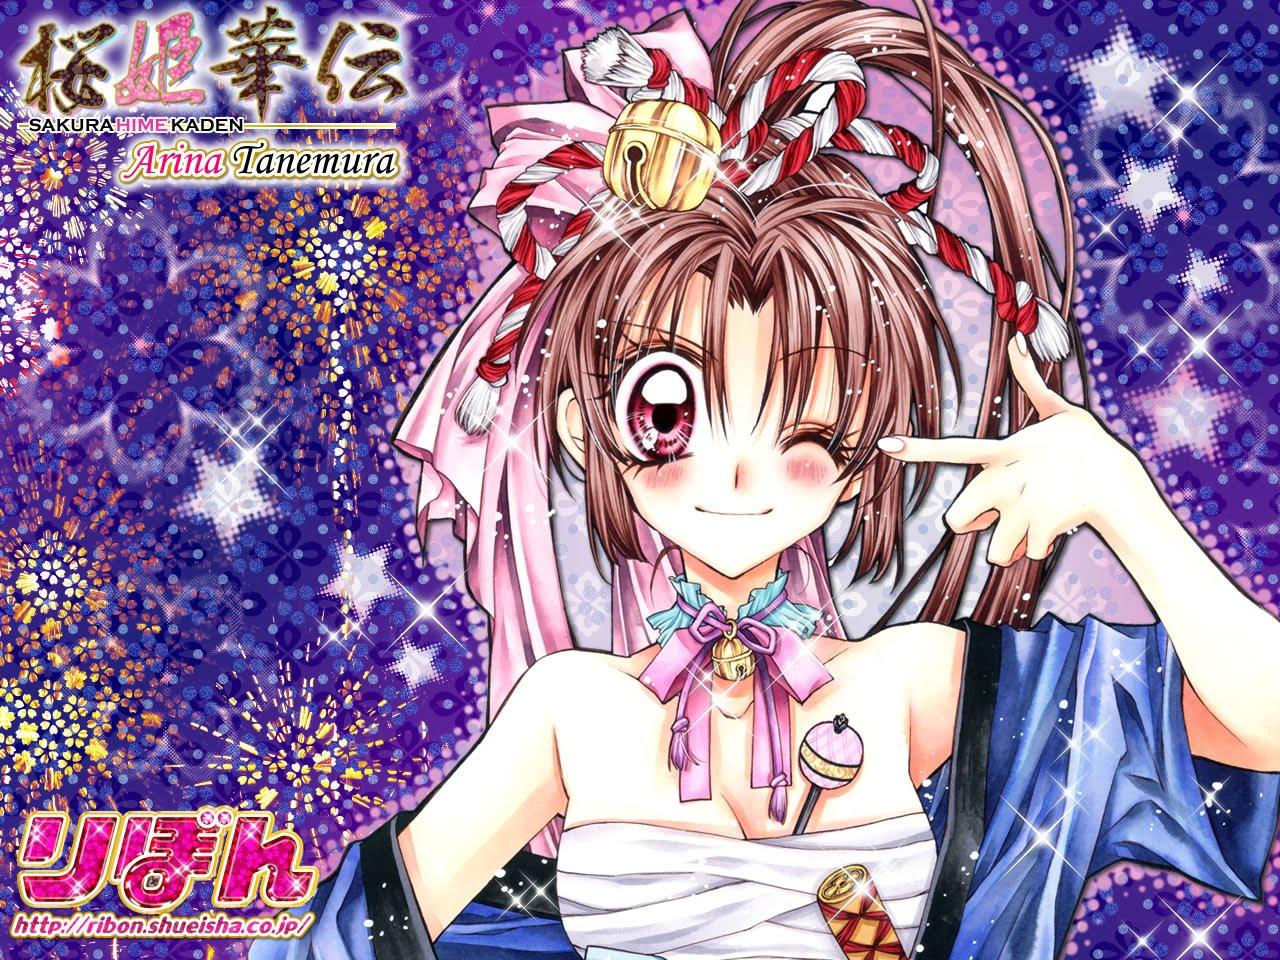 http://4.bp.blogspot.com/_in5YIFz6Dbw/TCyEoAnpEhI/AAAAAAAABJs/1suCXFmhpGY/s1600/sakurahime.jpg